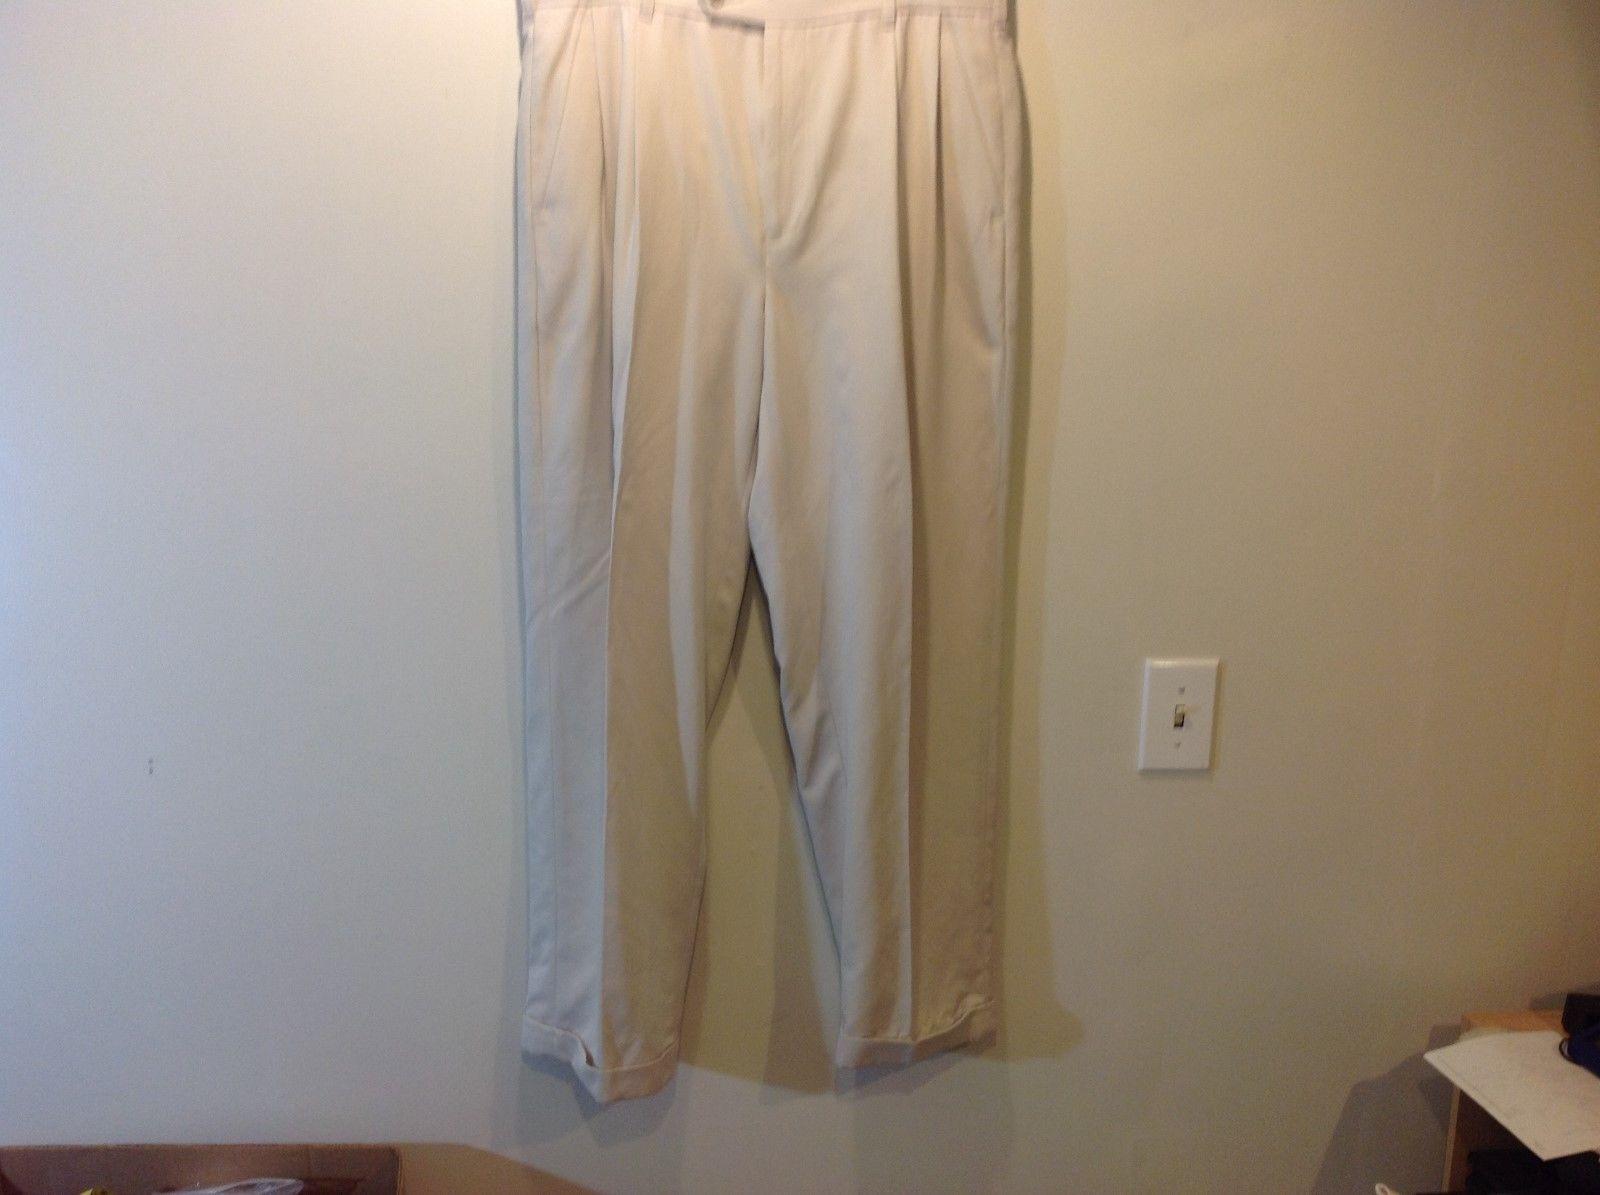 IZOD Men's Ivory Colored Cuffed Dress Pants